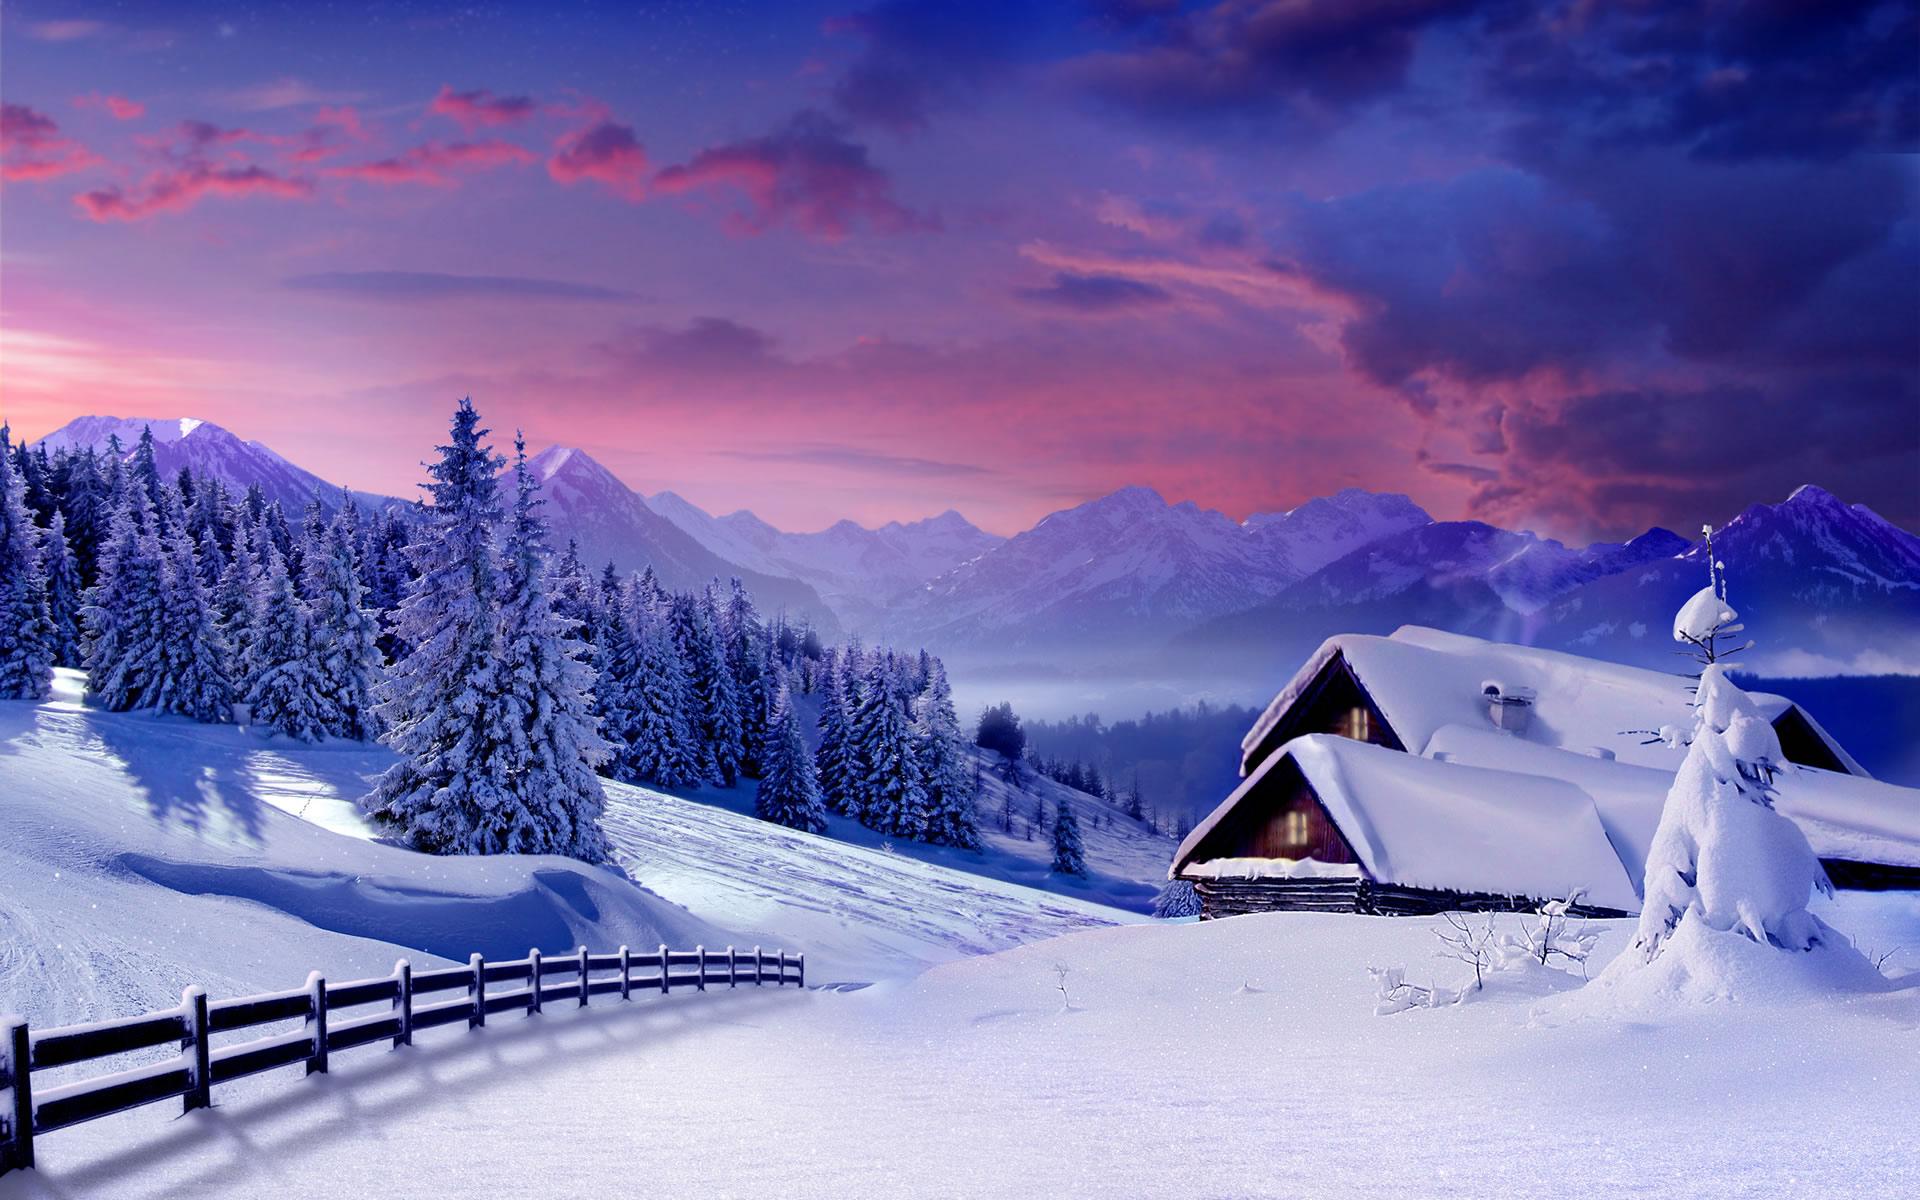 winter wallpaper 3 winter hd wallpapers 4 winter wallpaper 1920x1200